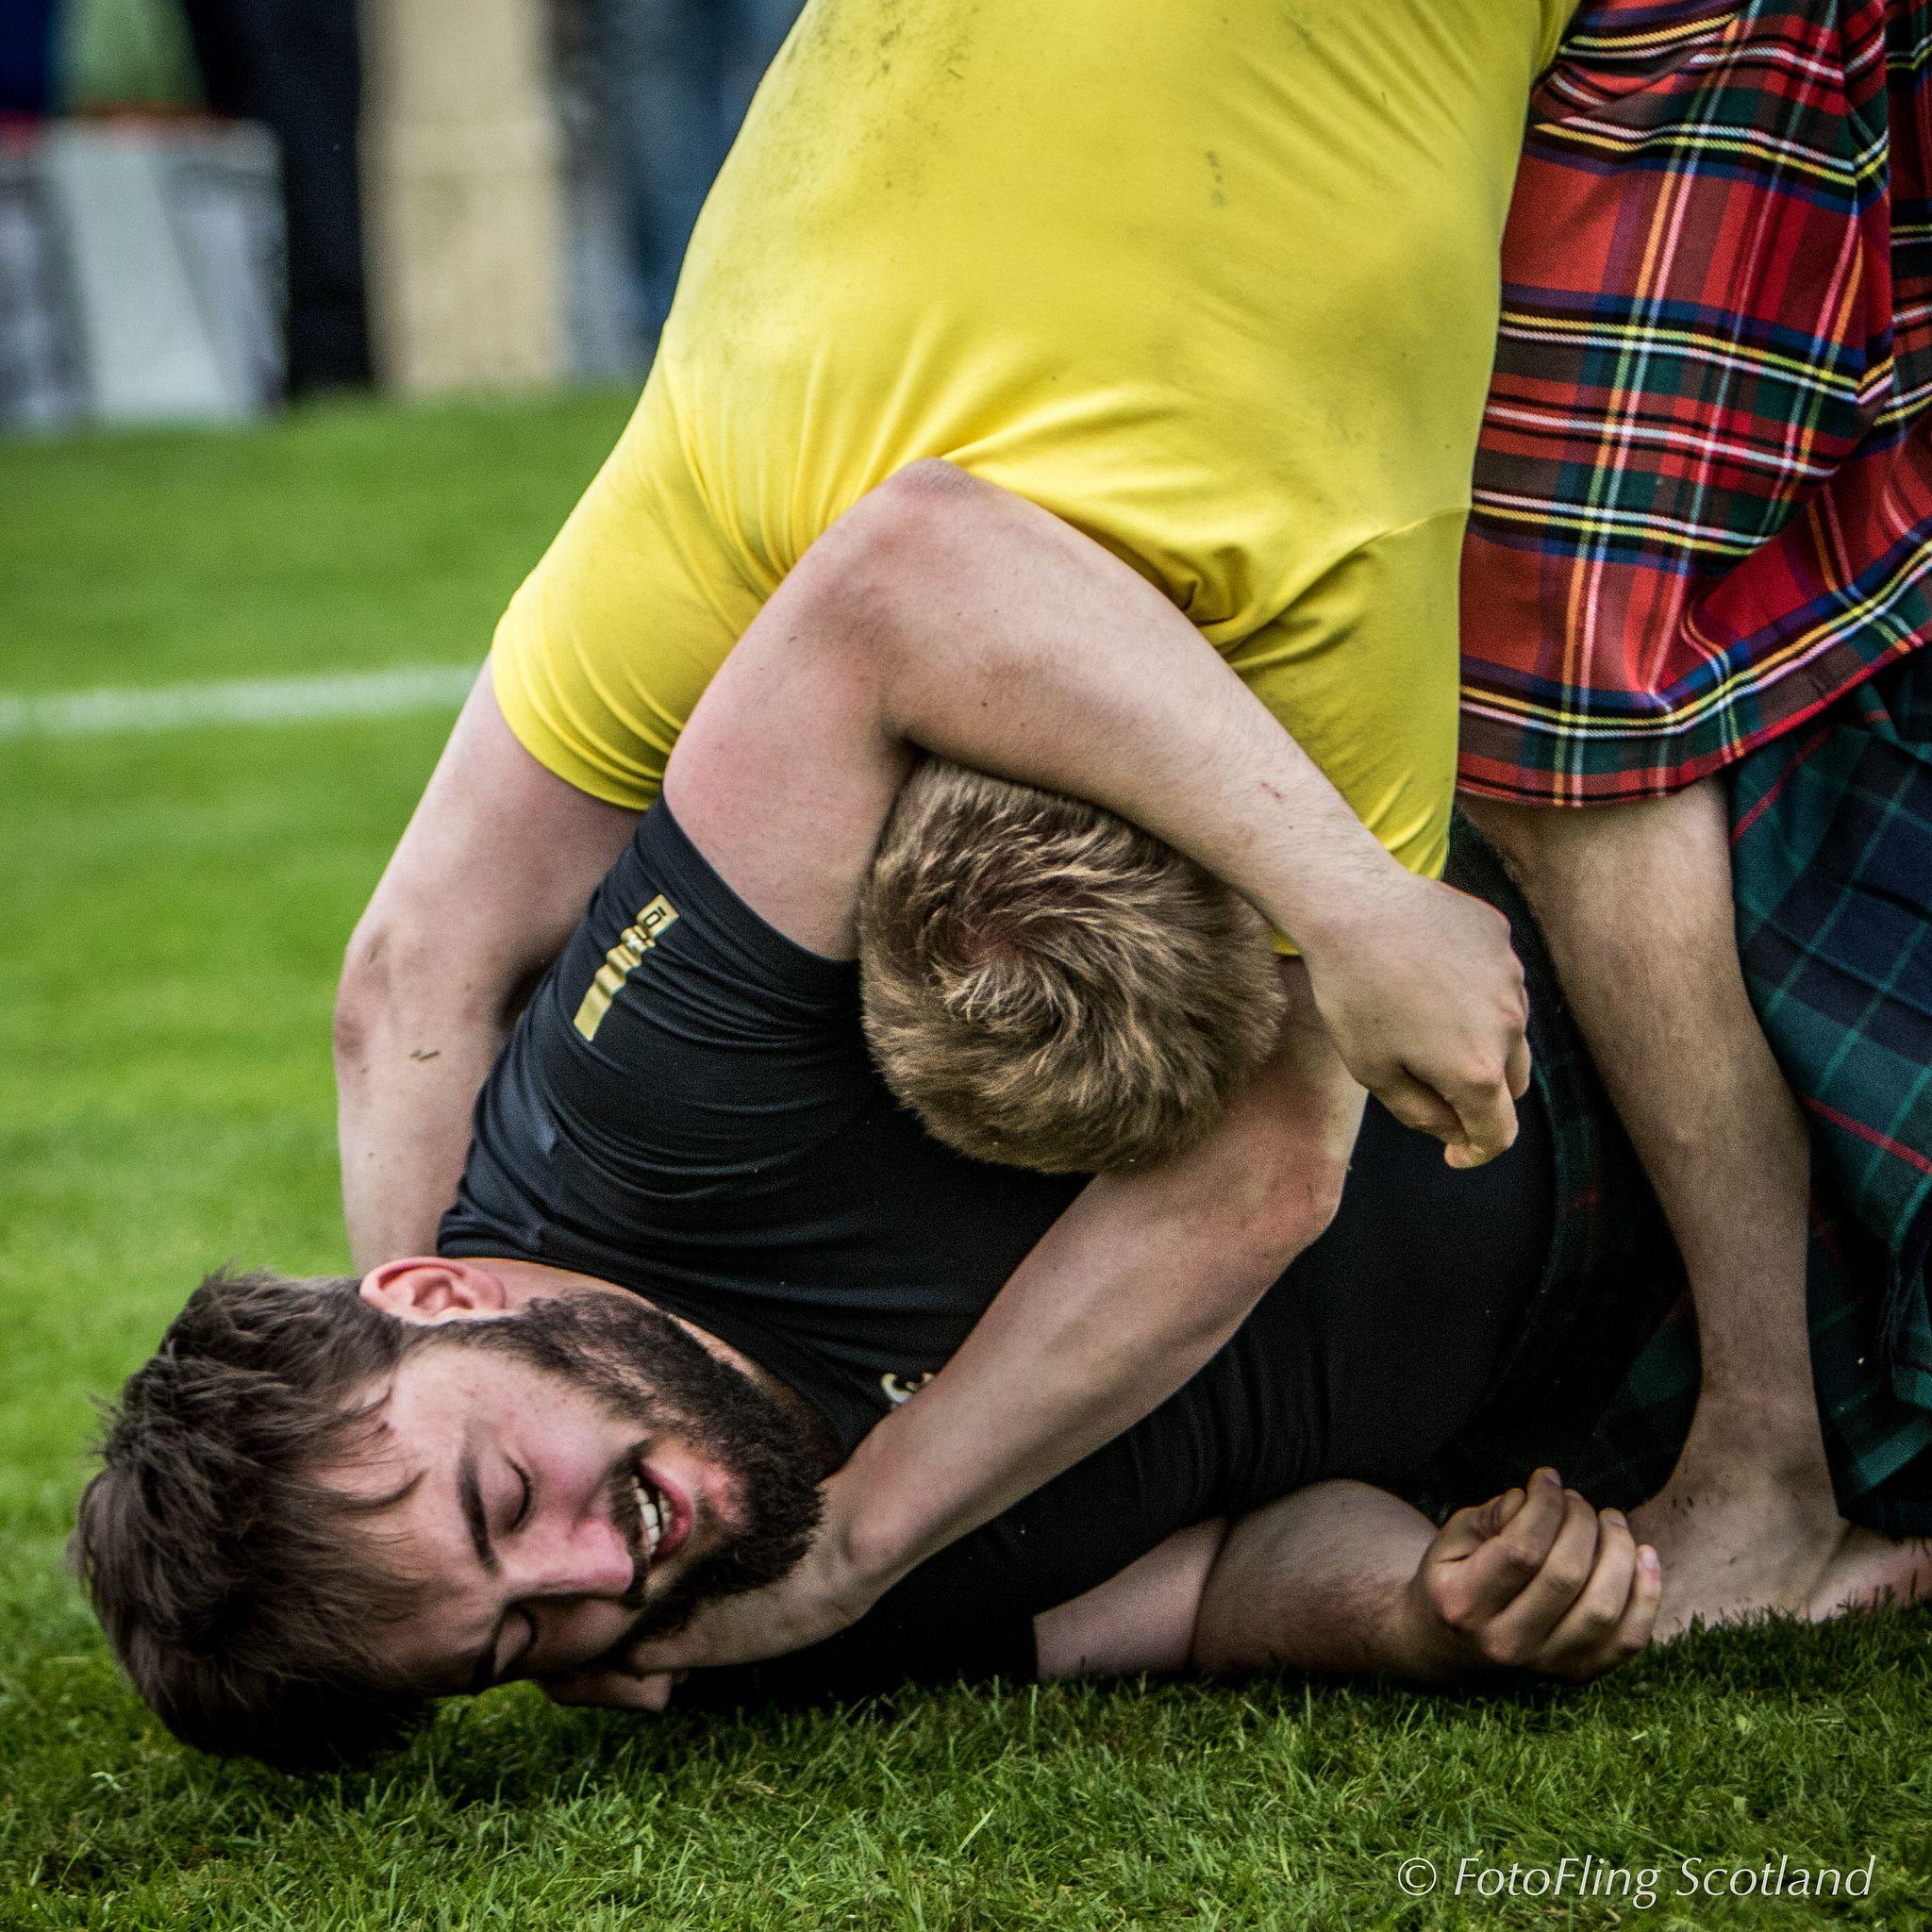 Scottish Backhold Wrestlers Matthew Southwell Ryan Ferrey Highland Games Sports Wrestling